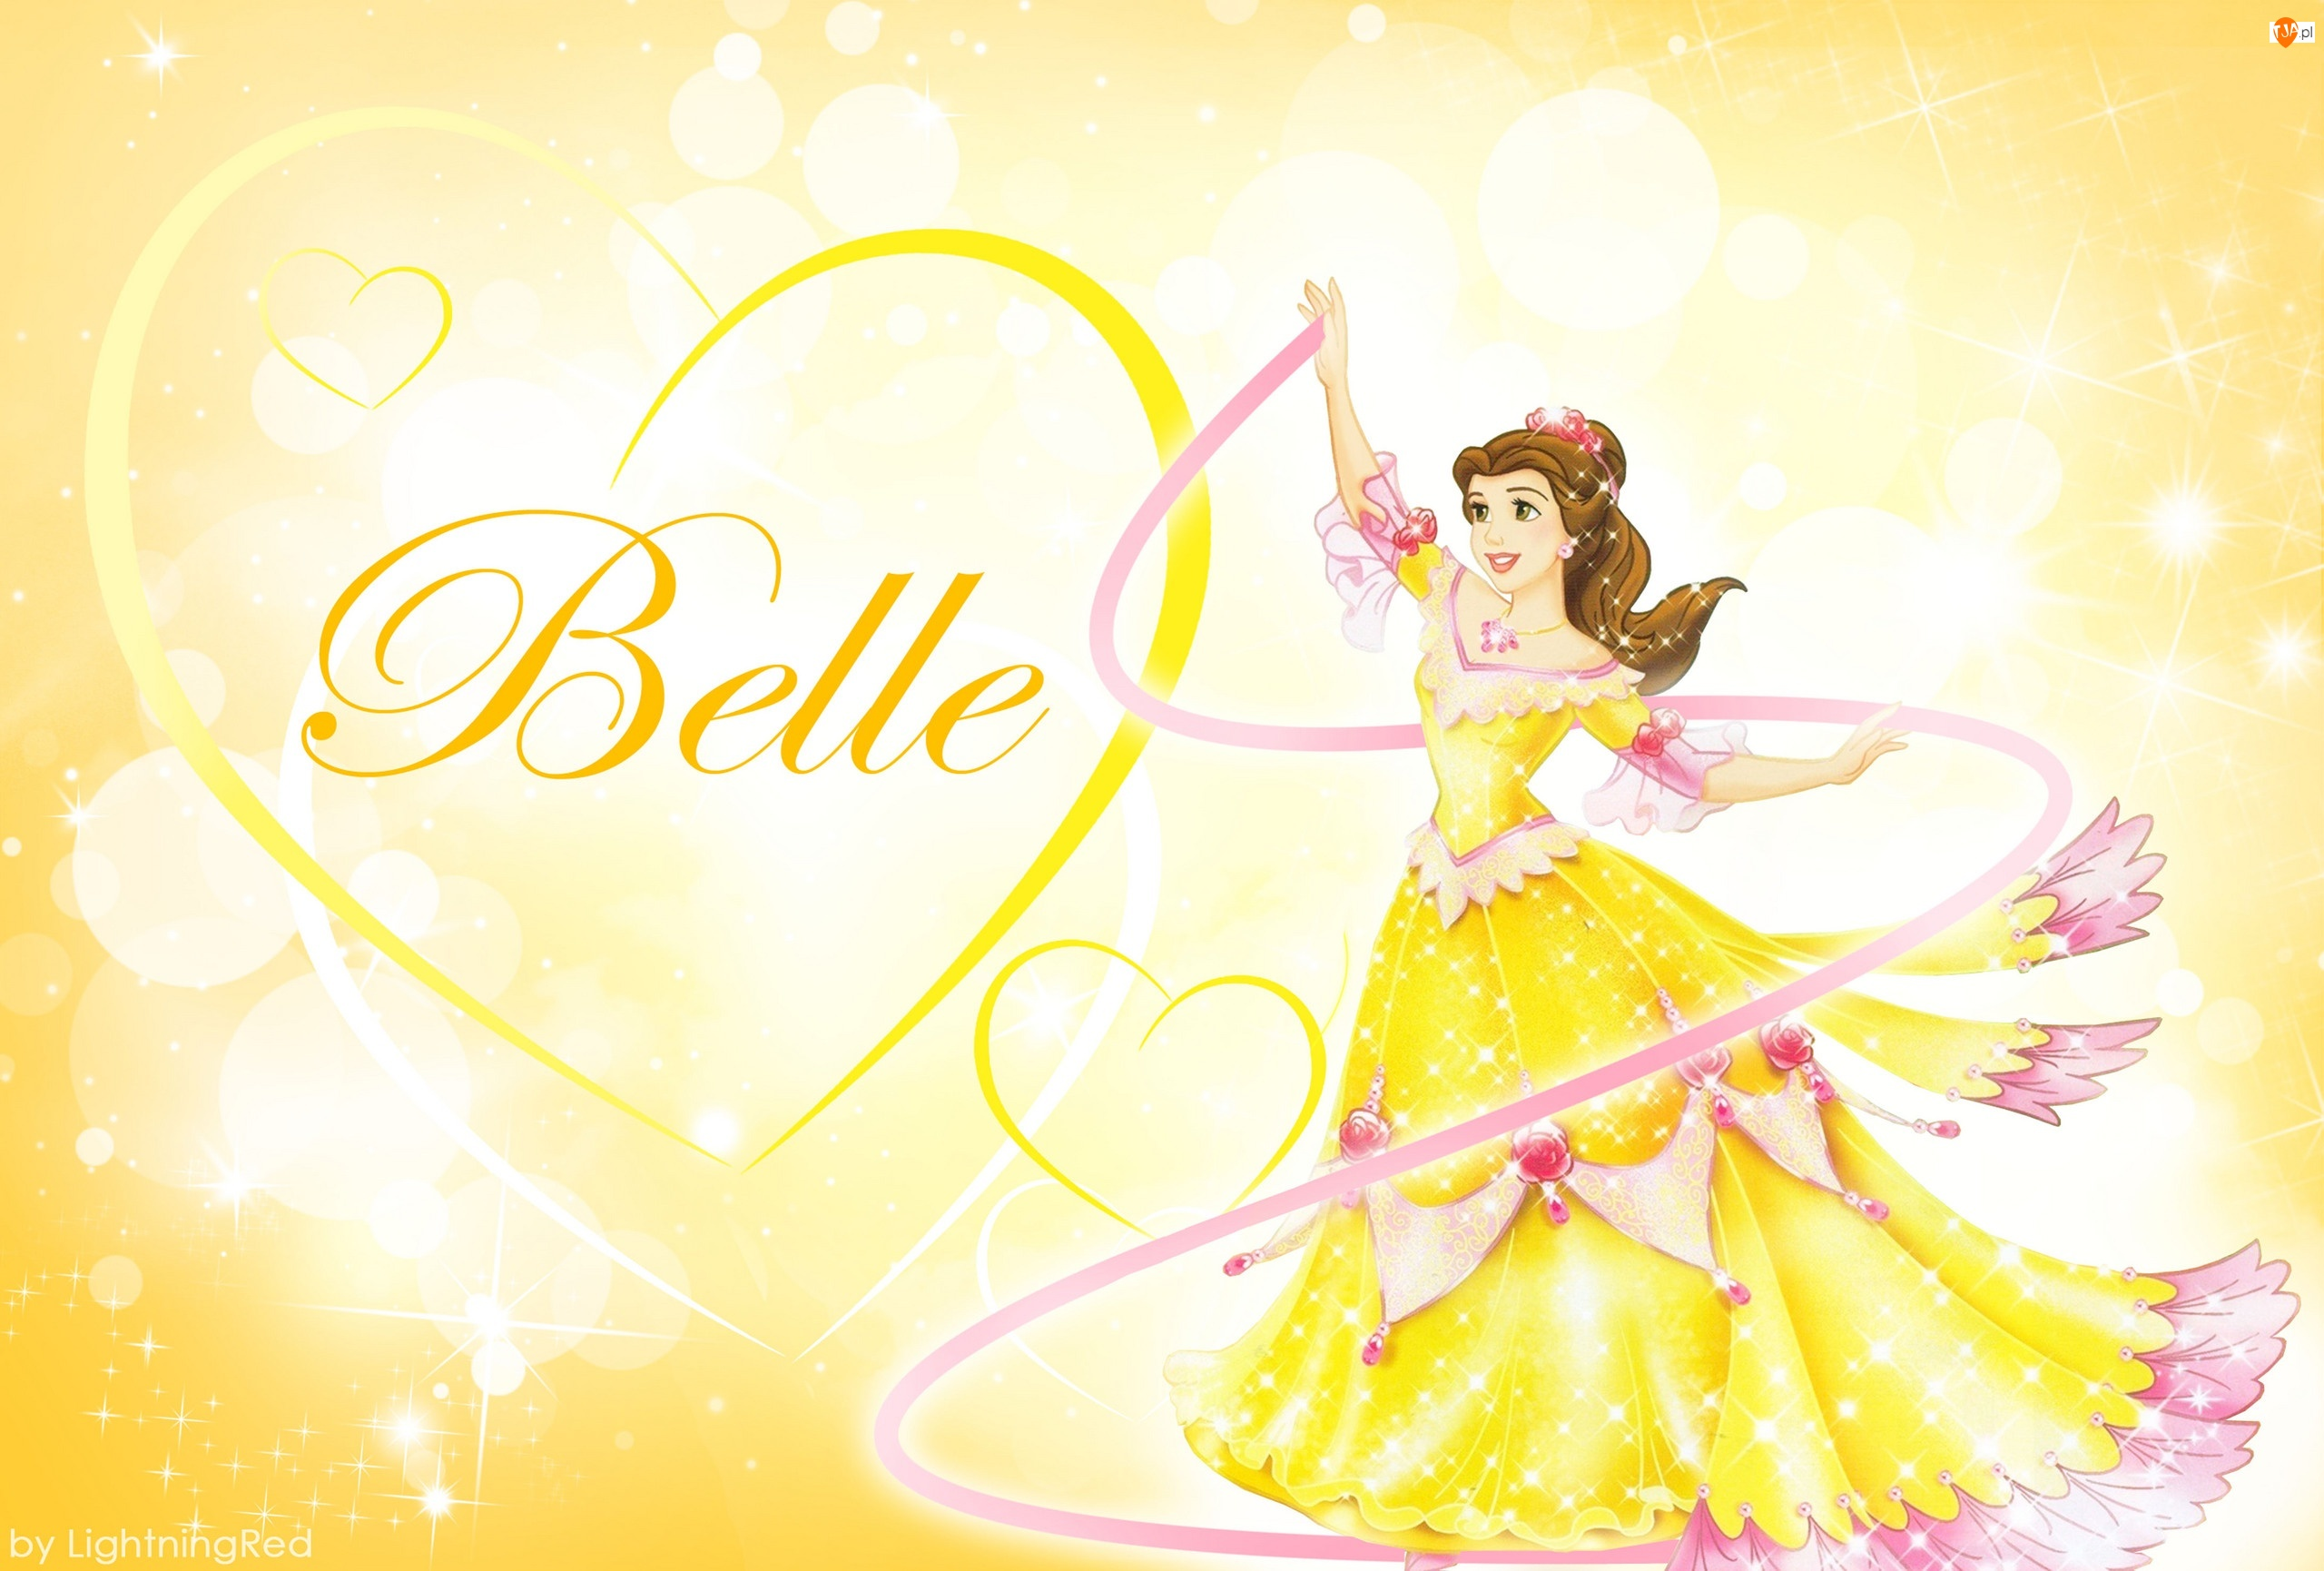 Bella, Beauty and the Beast, Księżniczka, Bajka, Piękna i Bestia